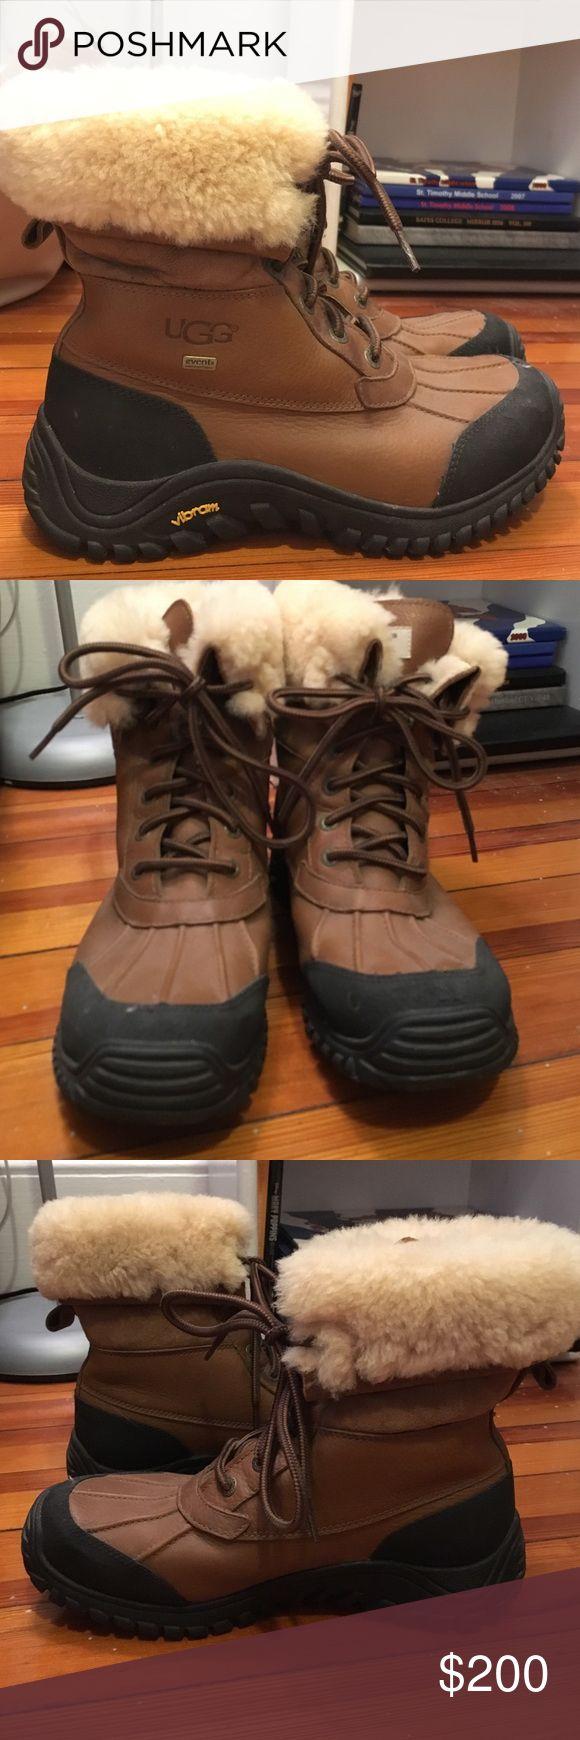 Ugg Australia Adirondack Boot Waterproof leather Ugg winter boots with sheepskin lining UGG Shoes Winter & Rain Boots